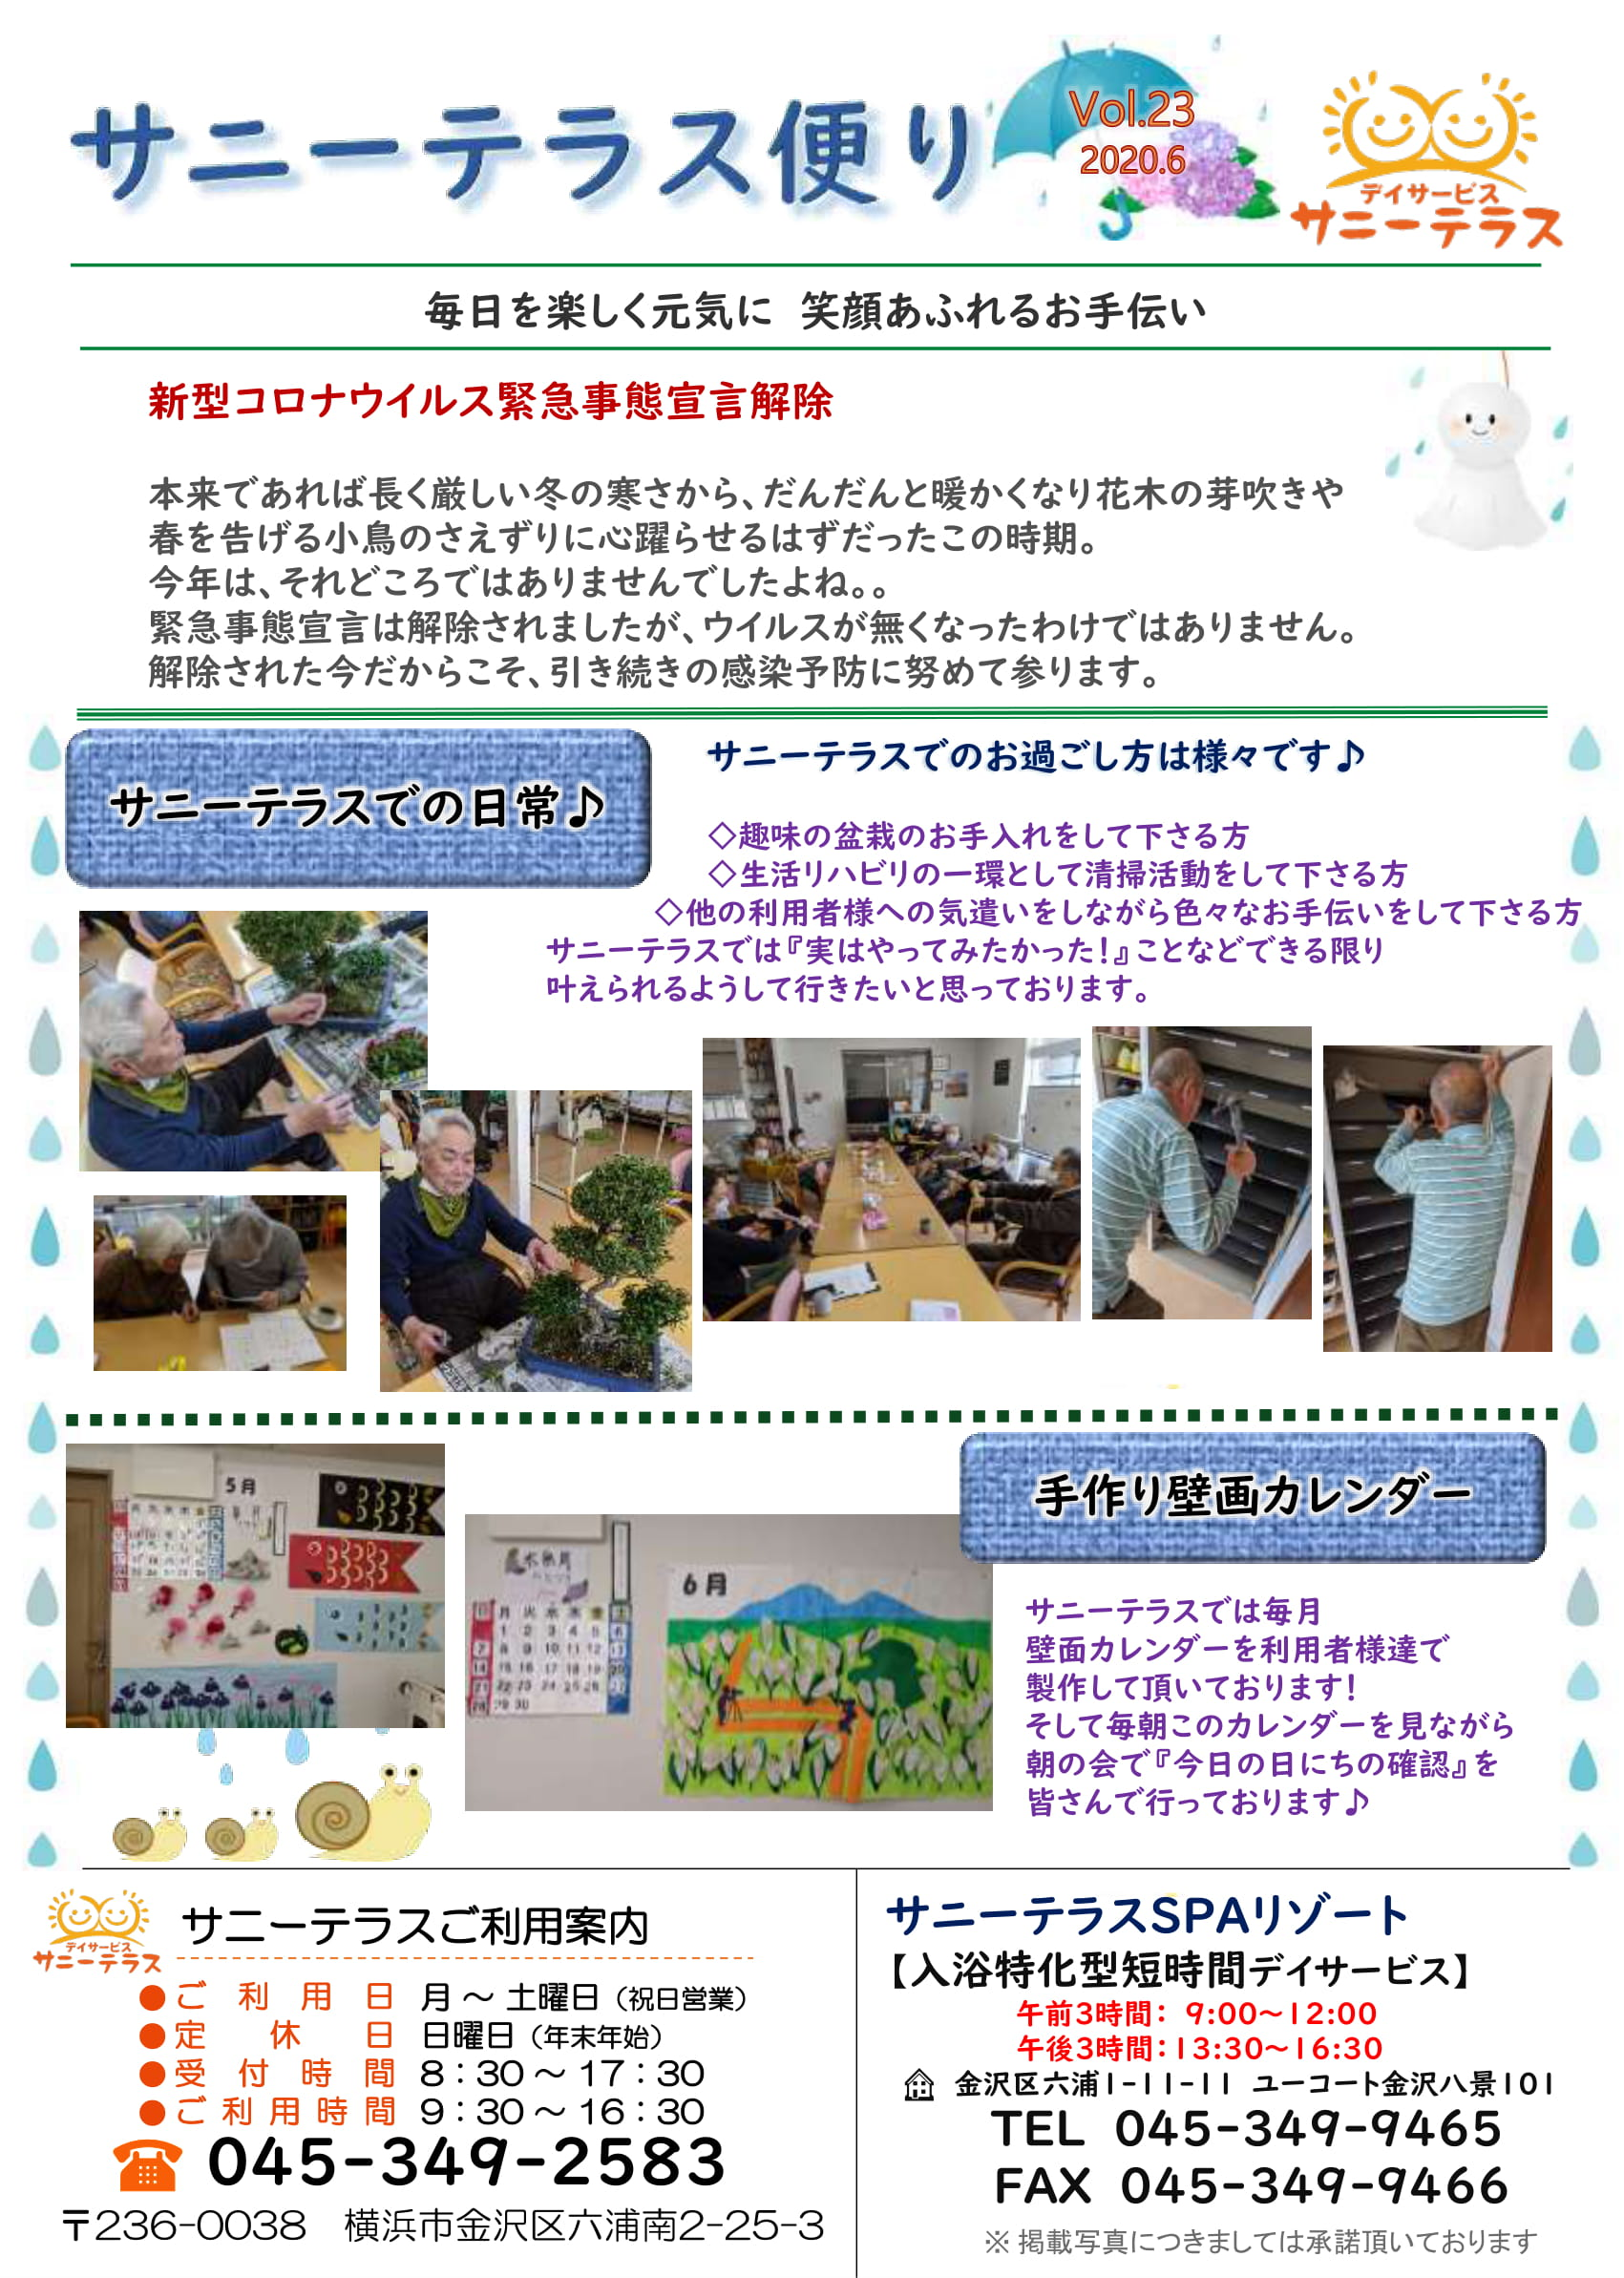 Vol.23-1.jpg